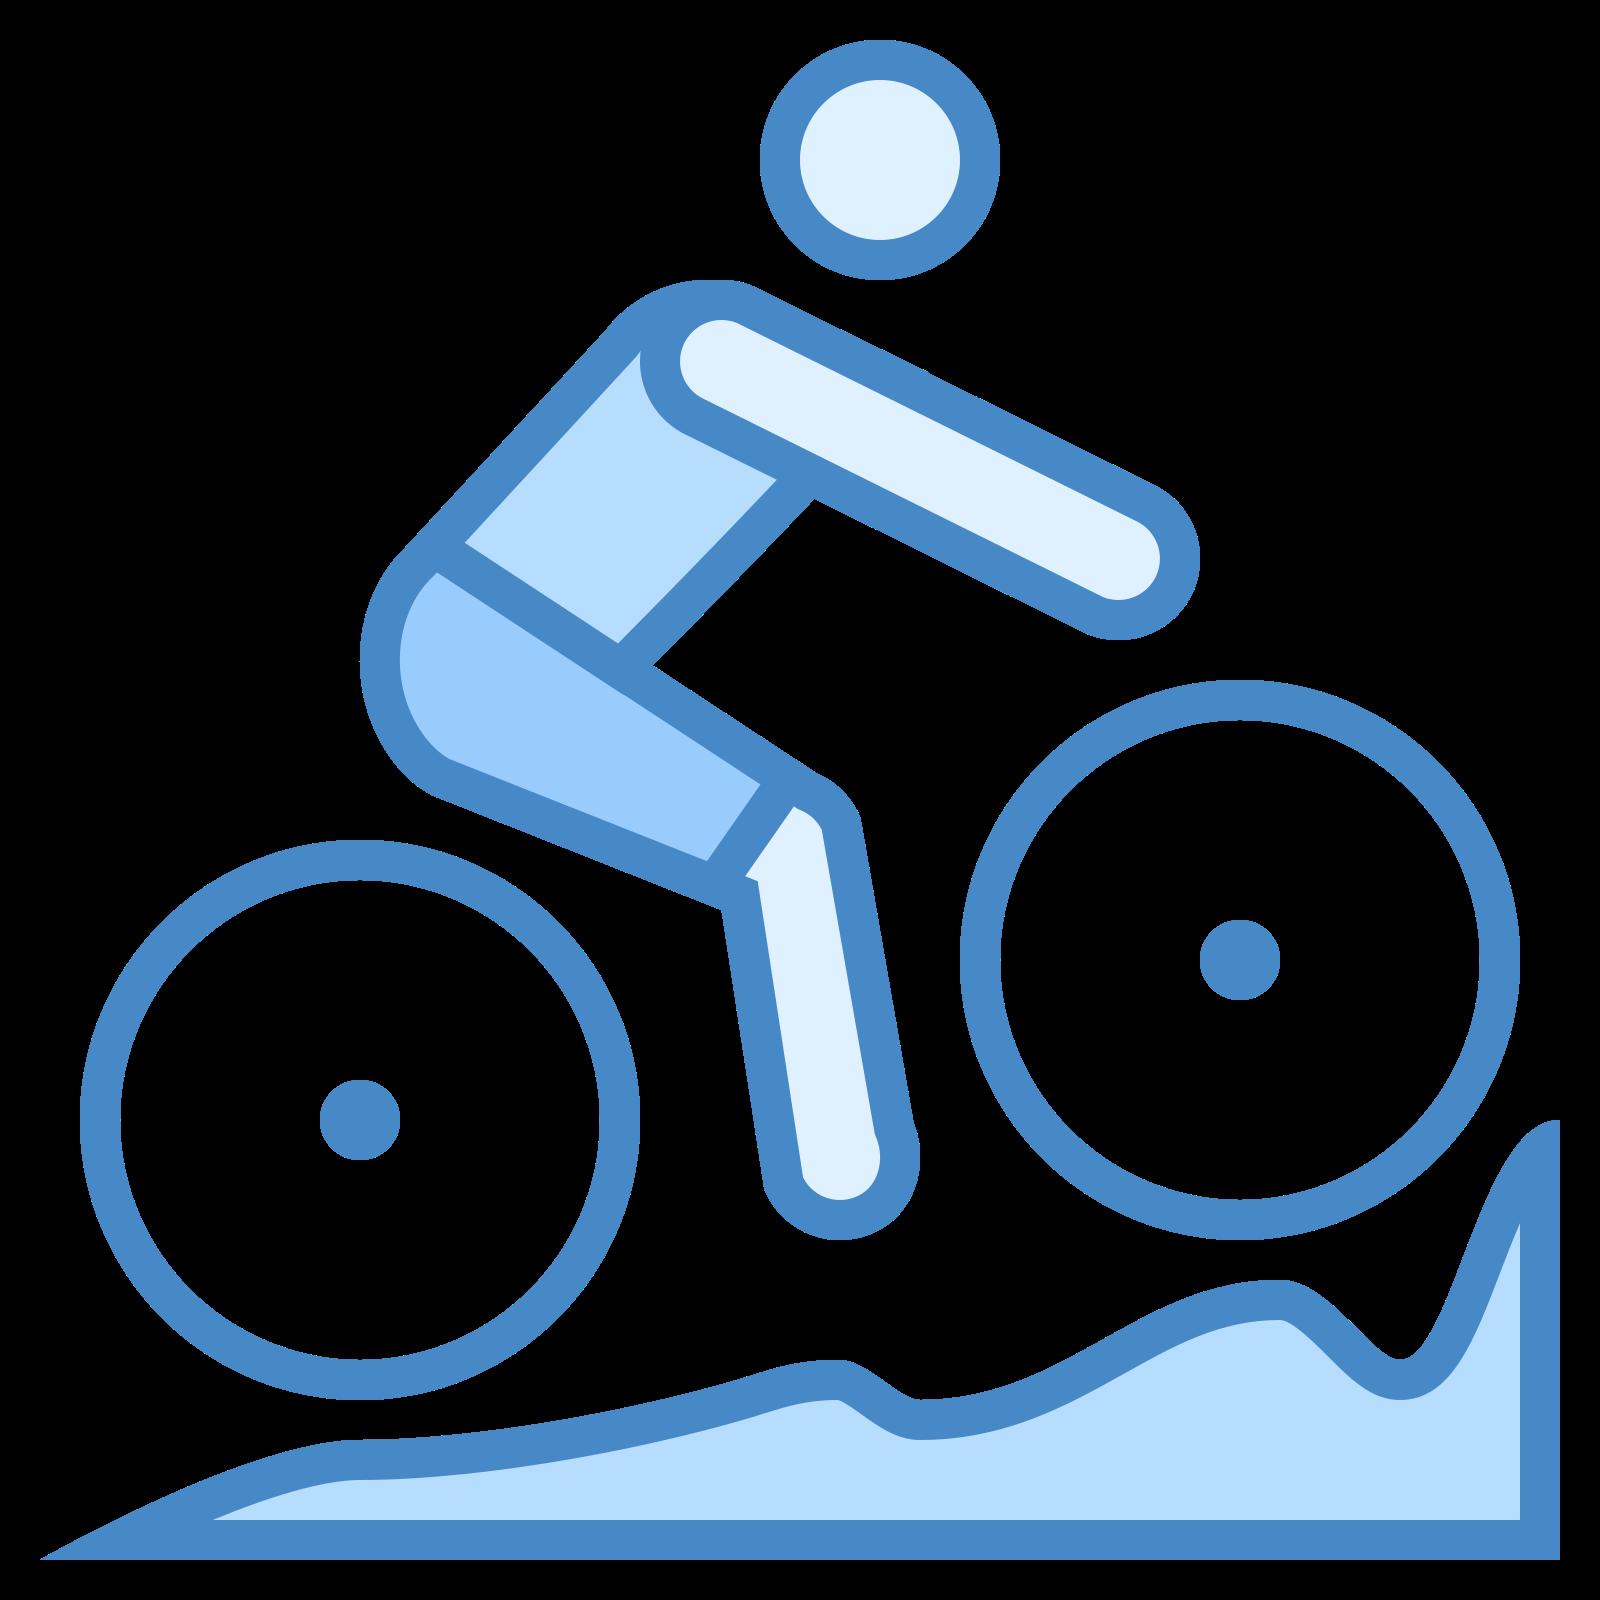 Ciclismo Mountain Bike icon